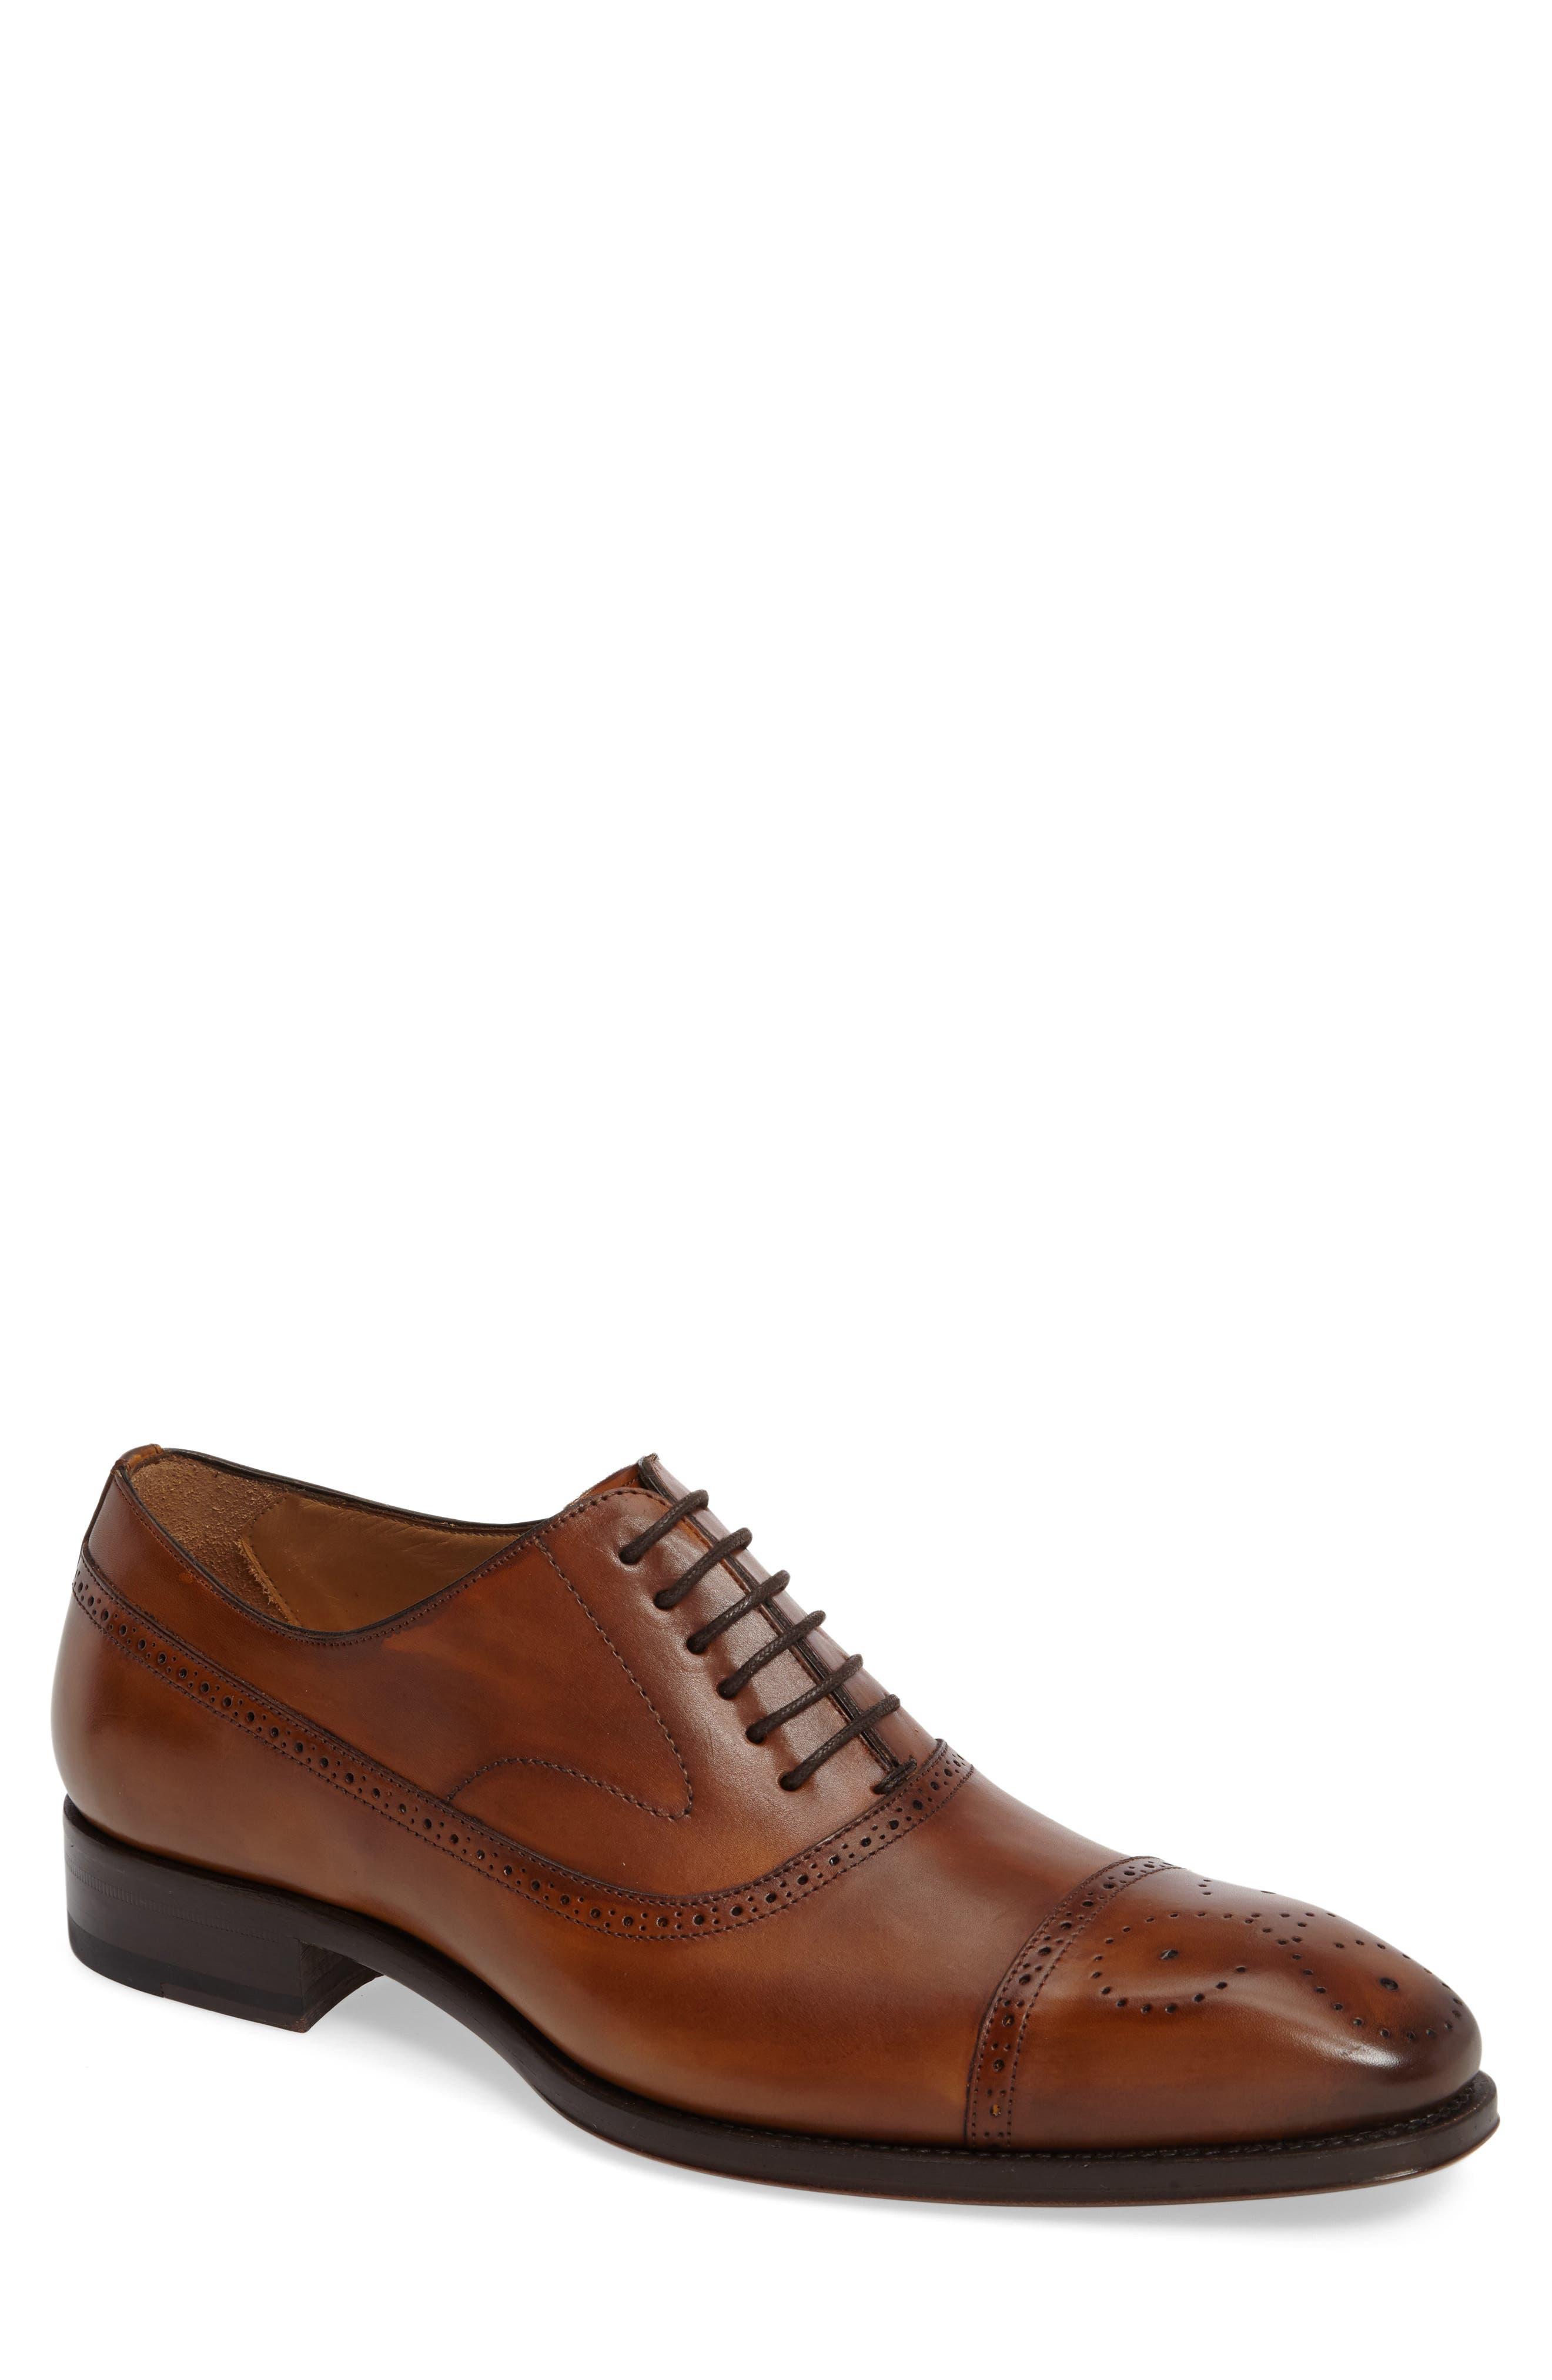 Alternate Image 1 Selected - Mezlan Alcala Cap Toe Oxford (Men)